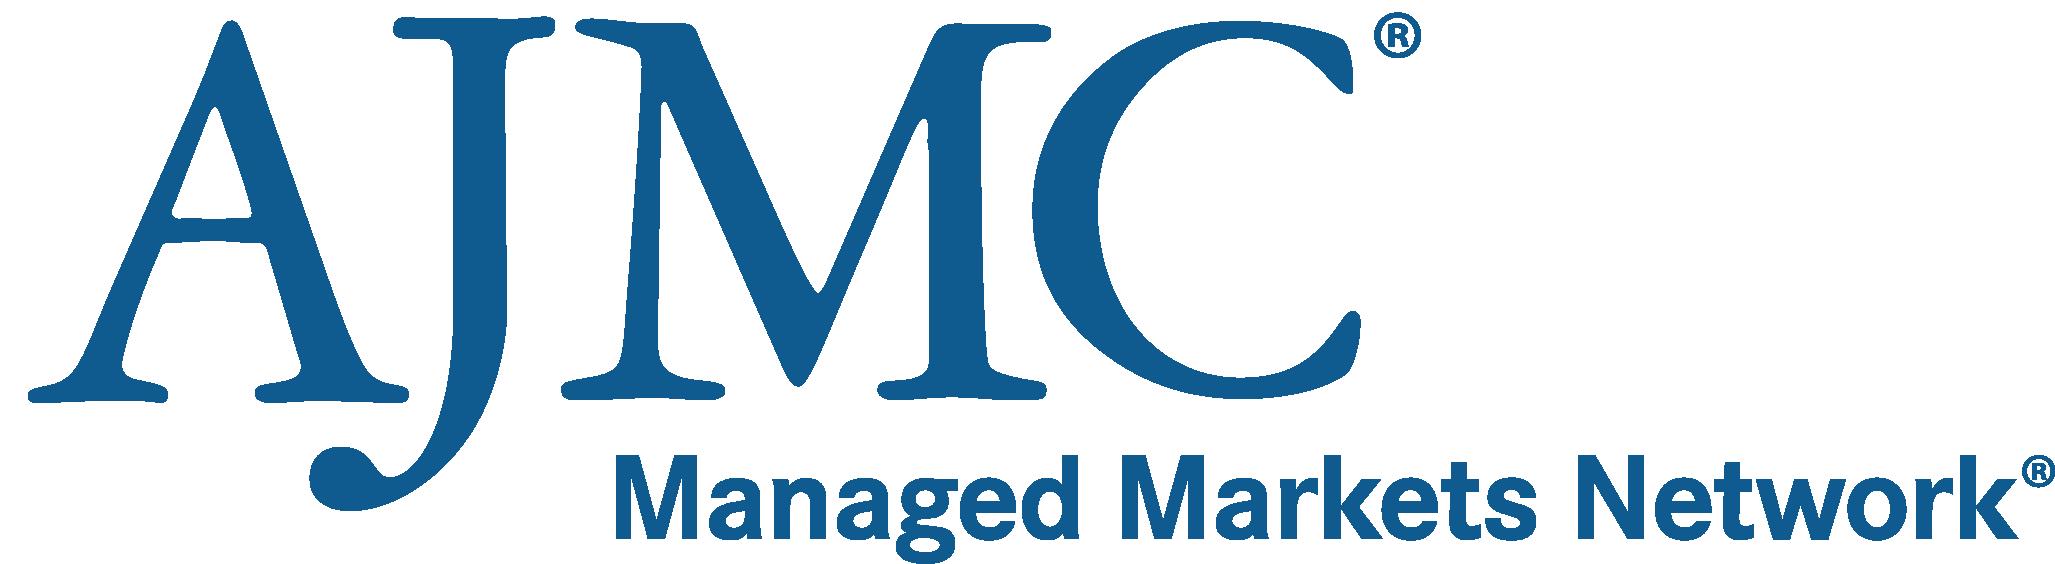 AJMC Logo